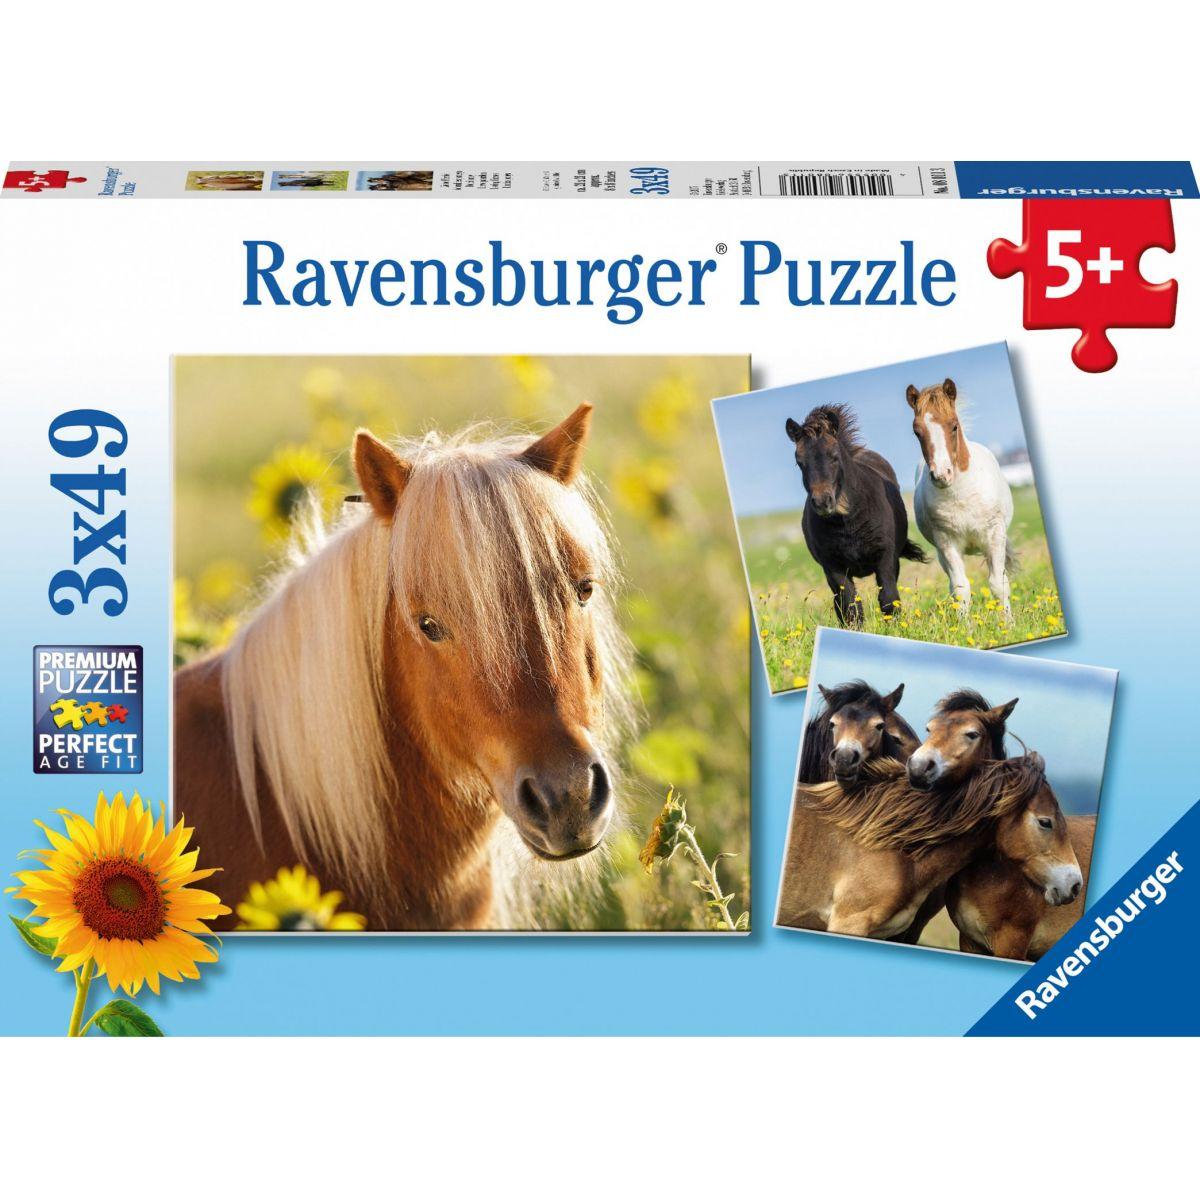 Ravensburger Puzzle Poníky 49 dielikov